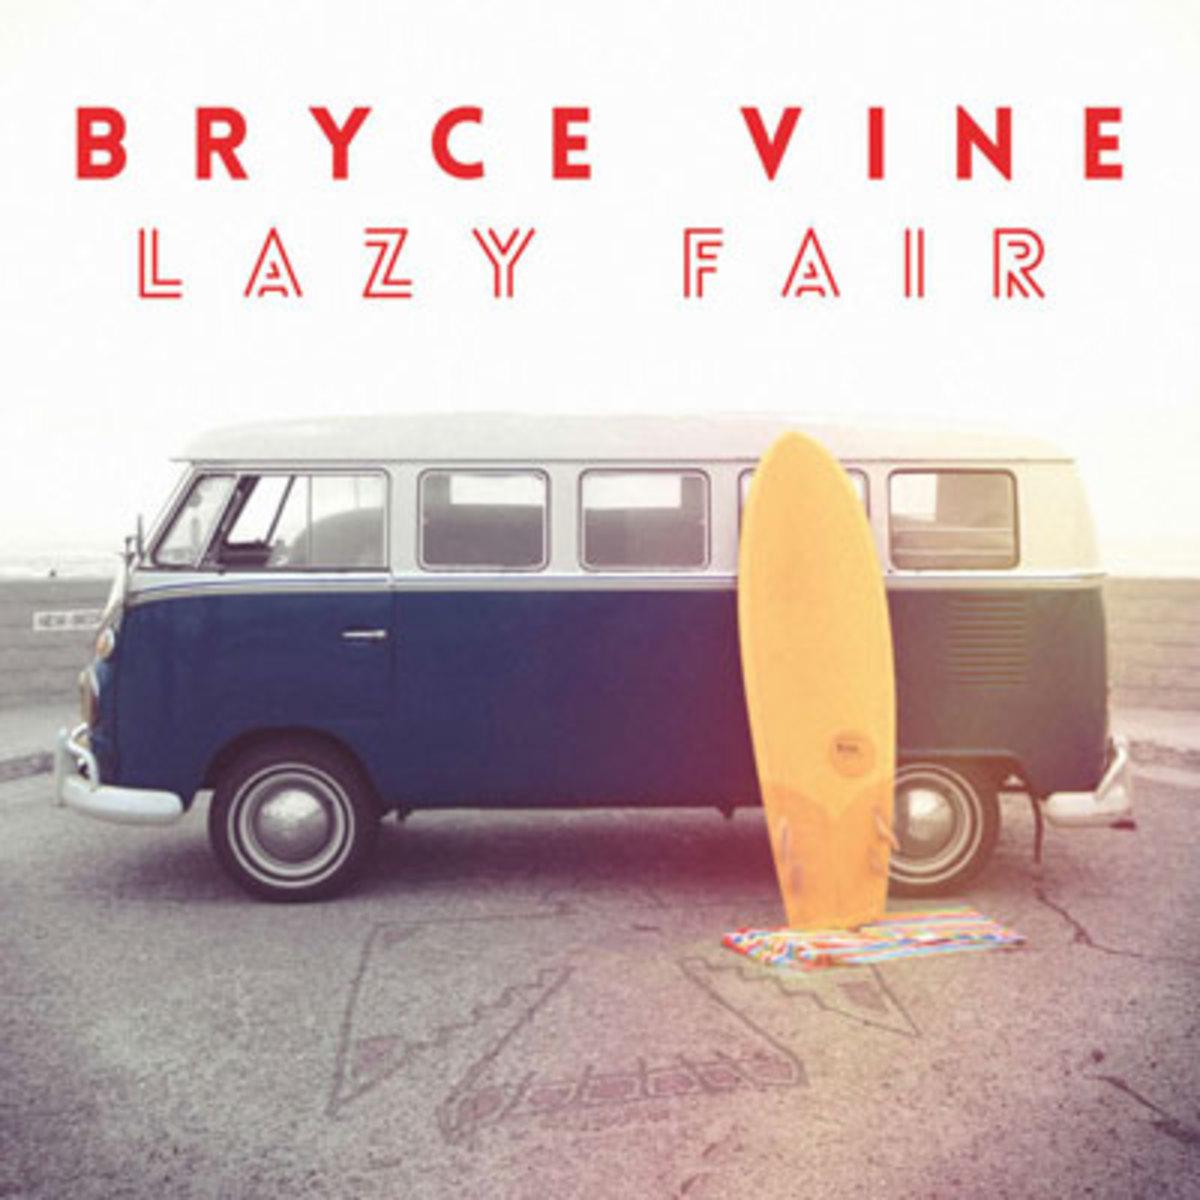 brycevine-lazyfair.jpg